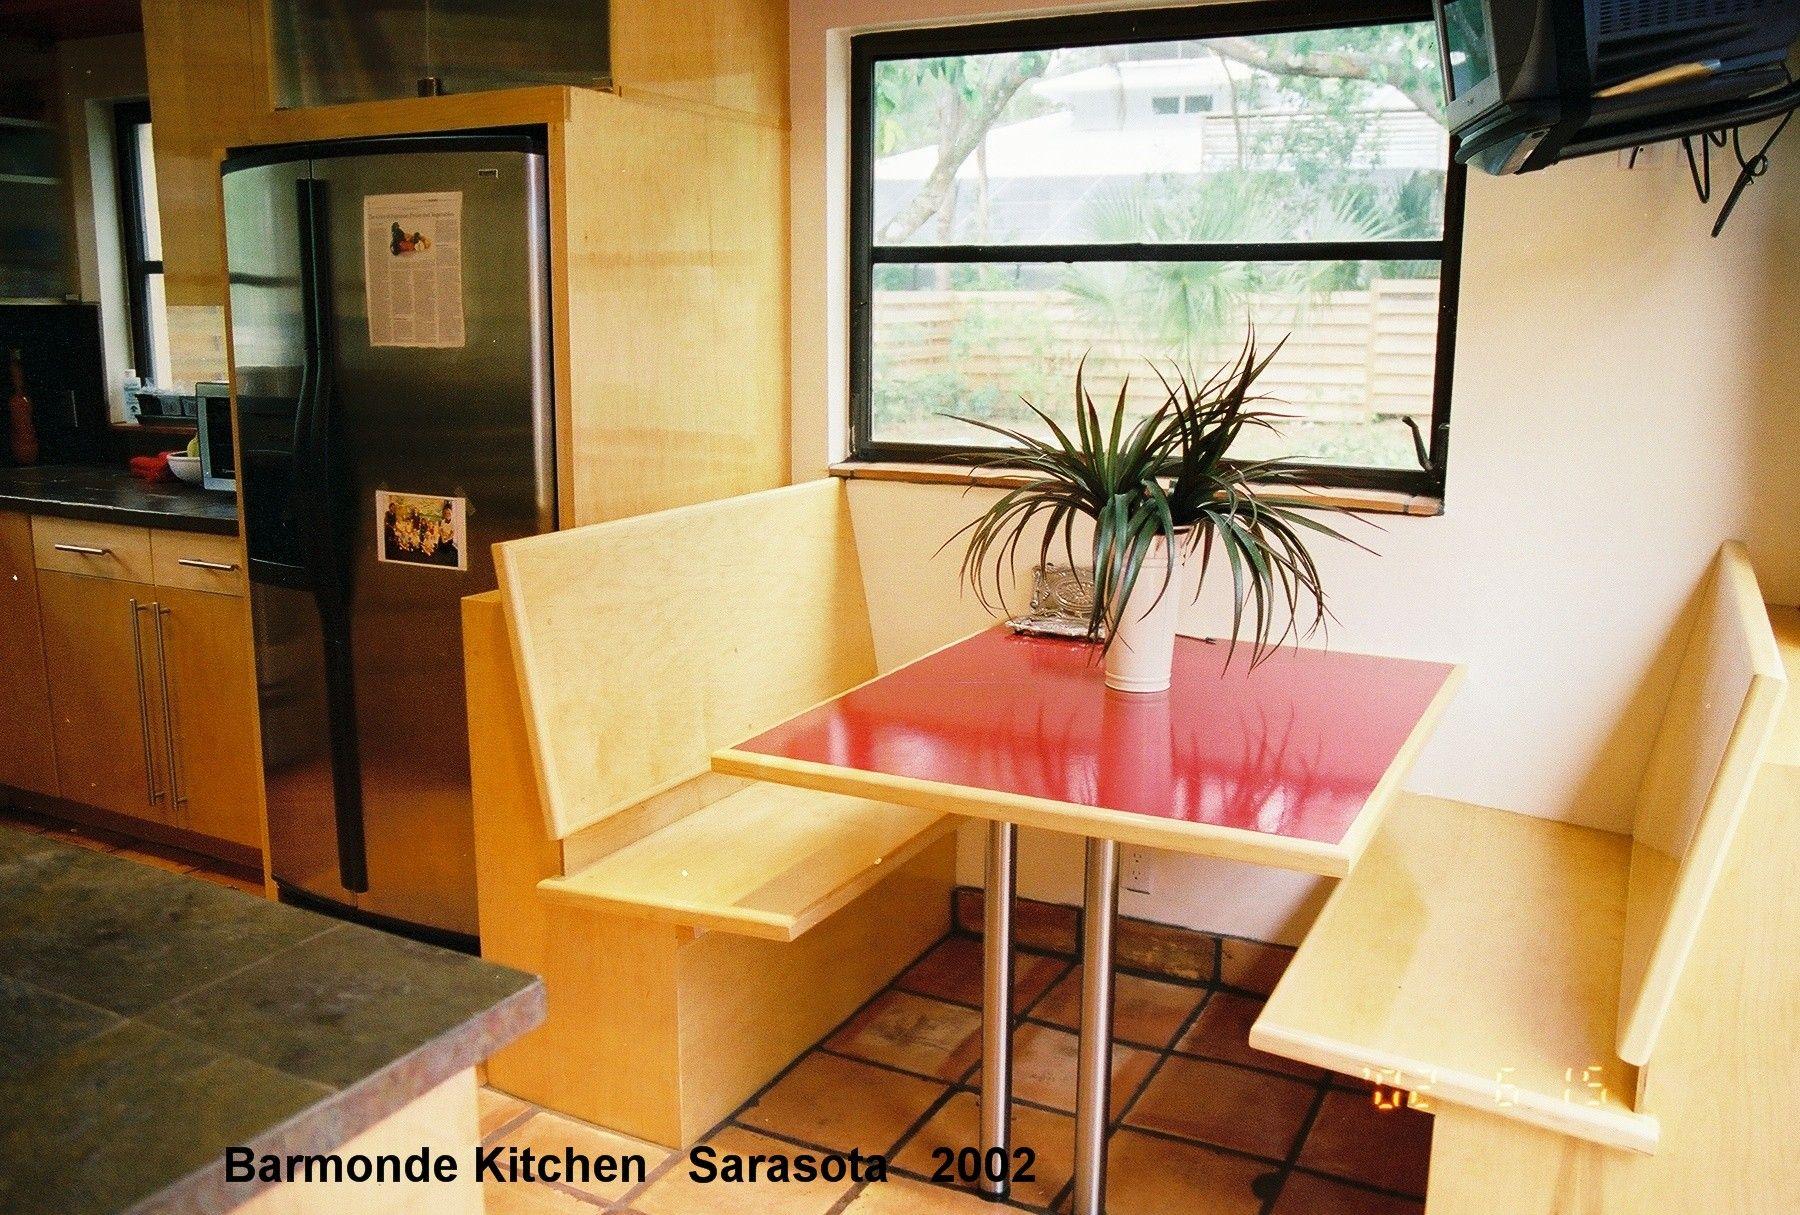 Barmonde Kitchen Interior Architectural Design 802